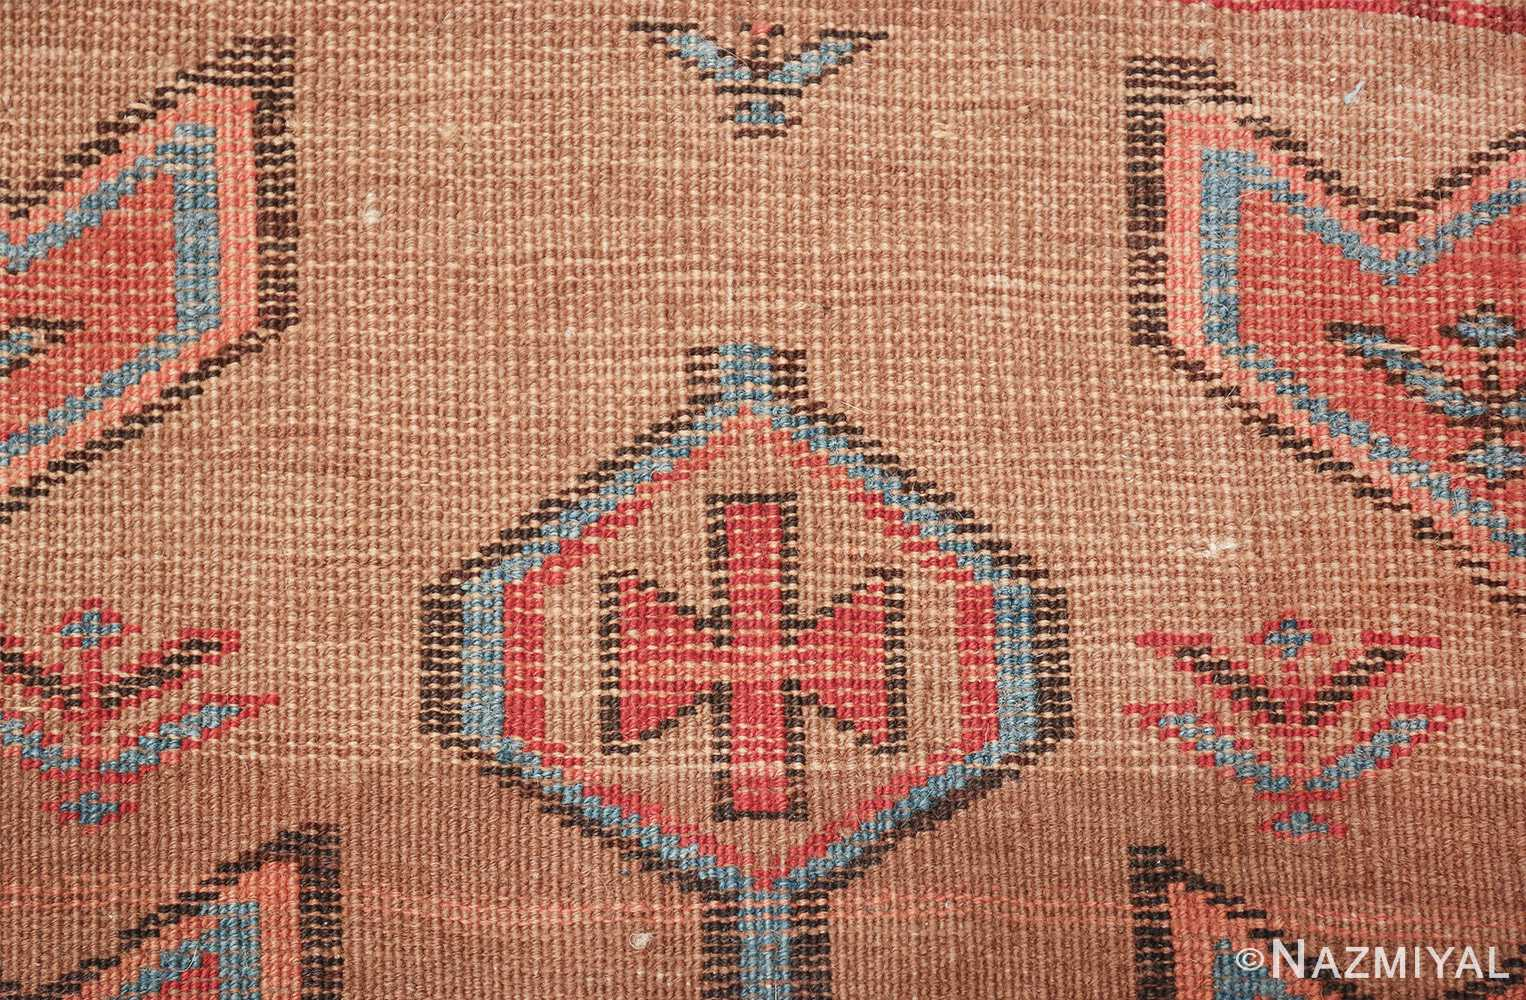 tribal antique persian bakshaish runner rug 49709 knots Nazmiyal